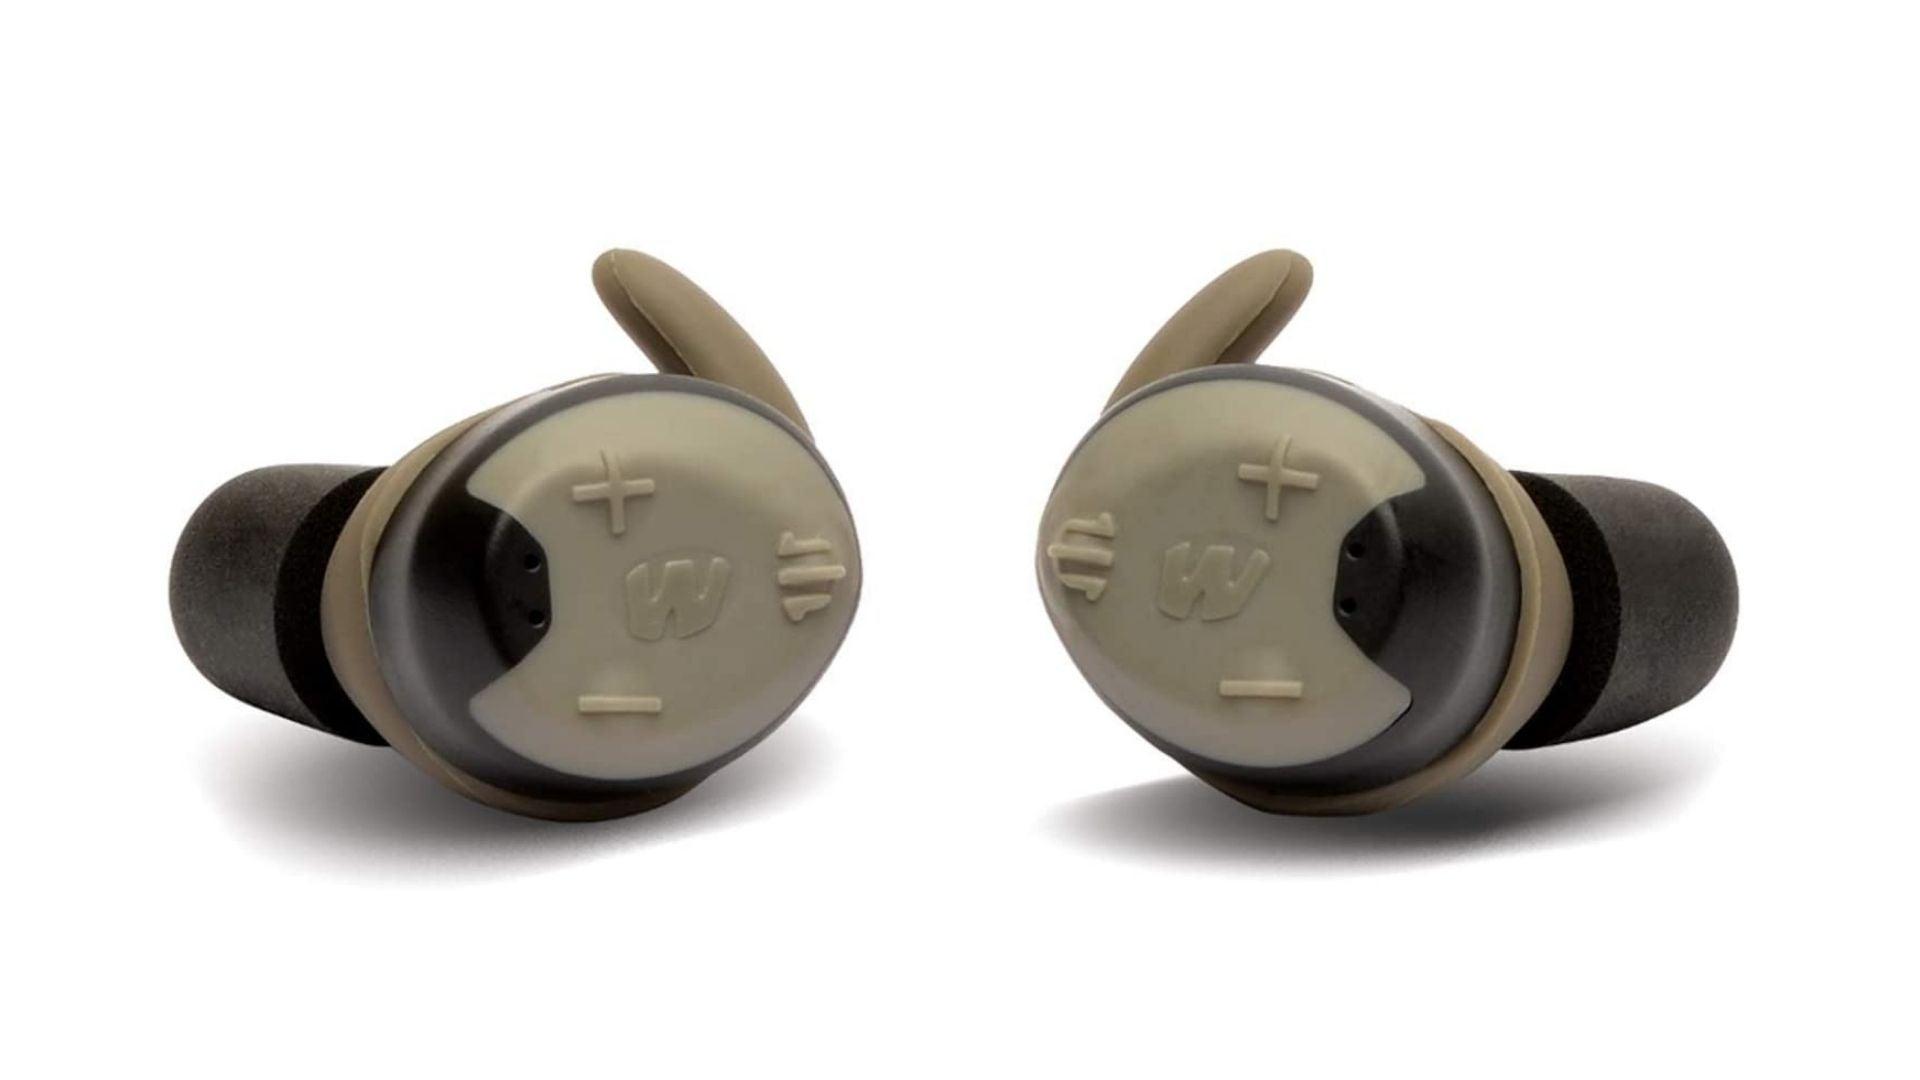 Walker's Silencer Bluetooth Digital Earbuds